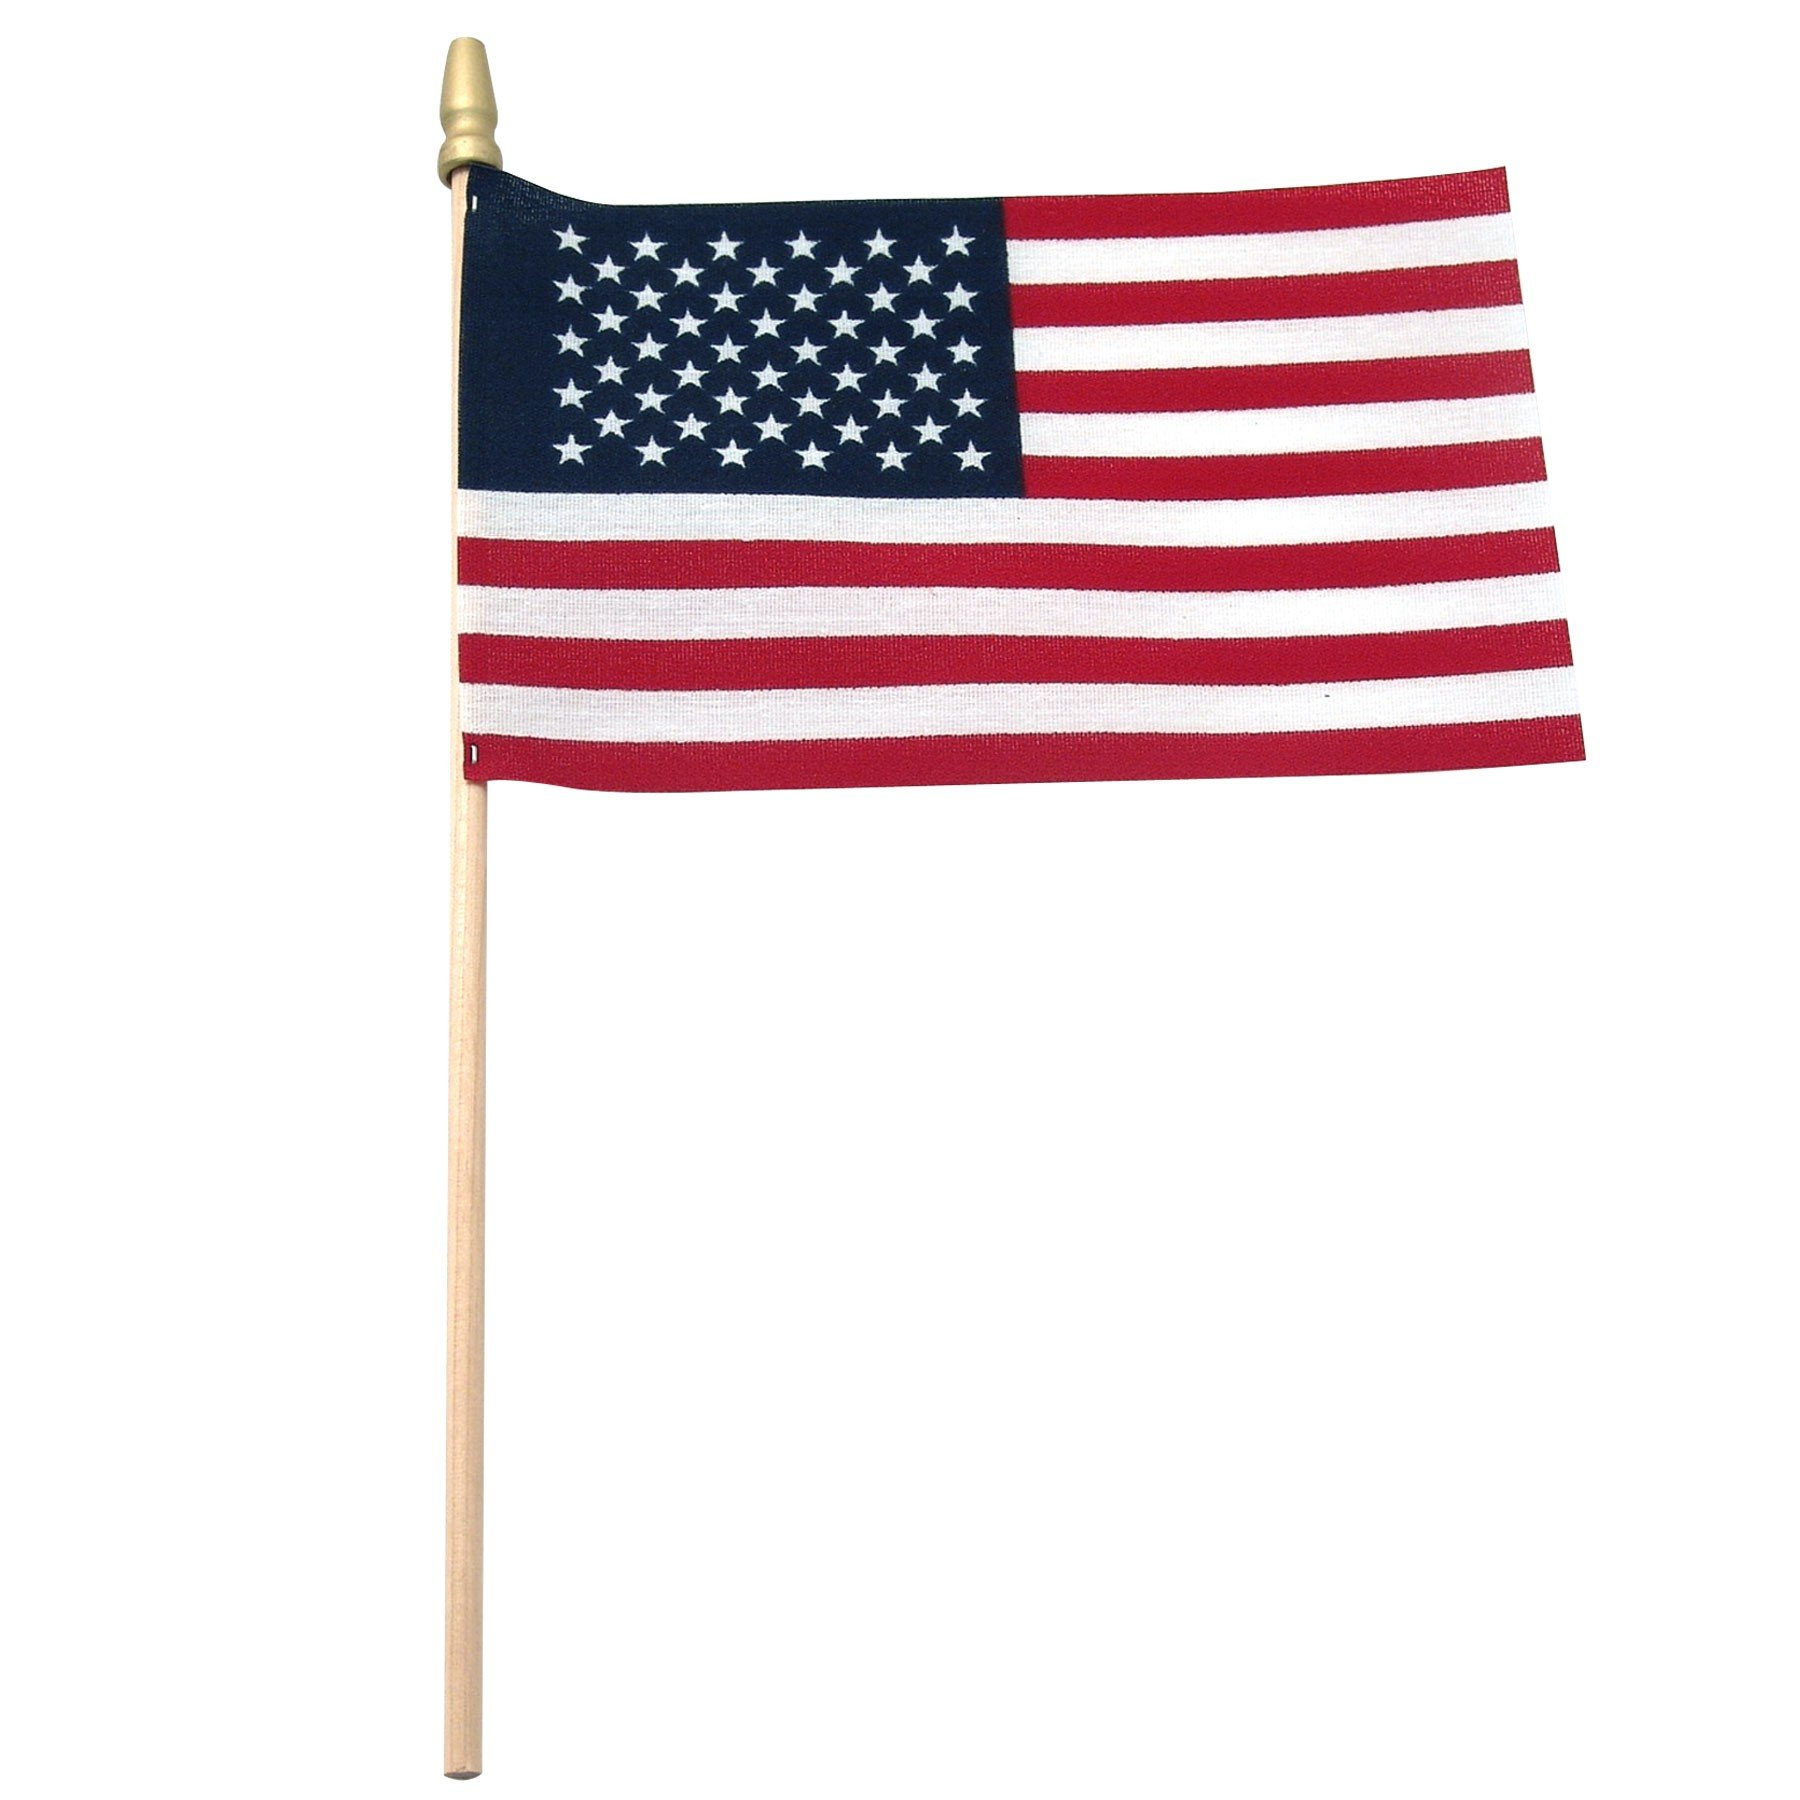 USA Stick Flag 4'' x 6'' Standard with Spear Tip (500 PK)